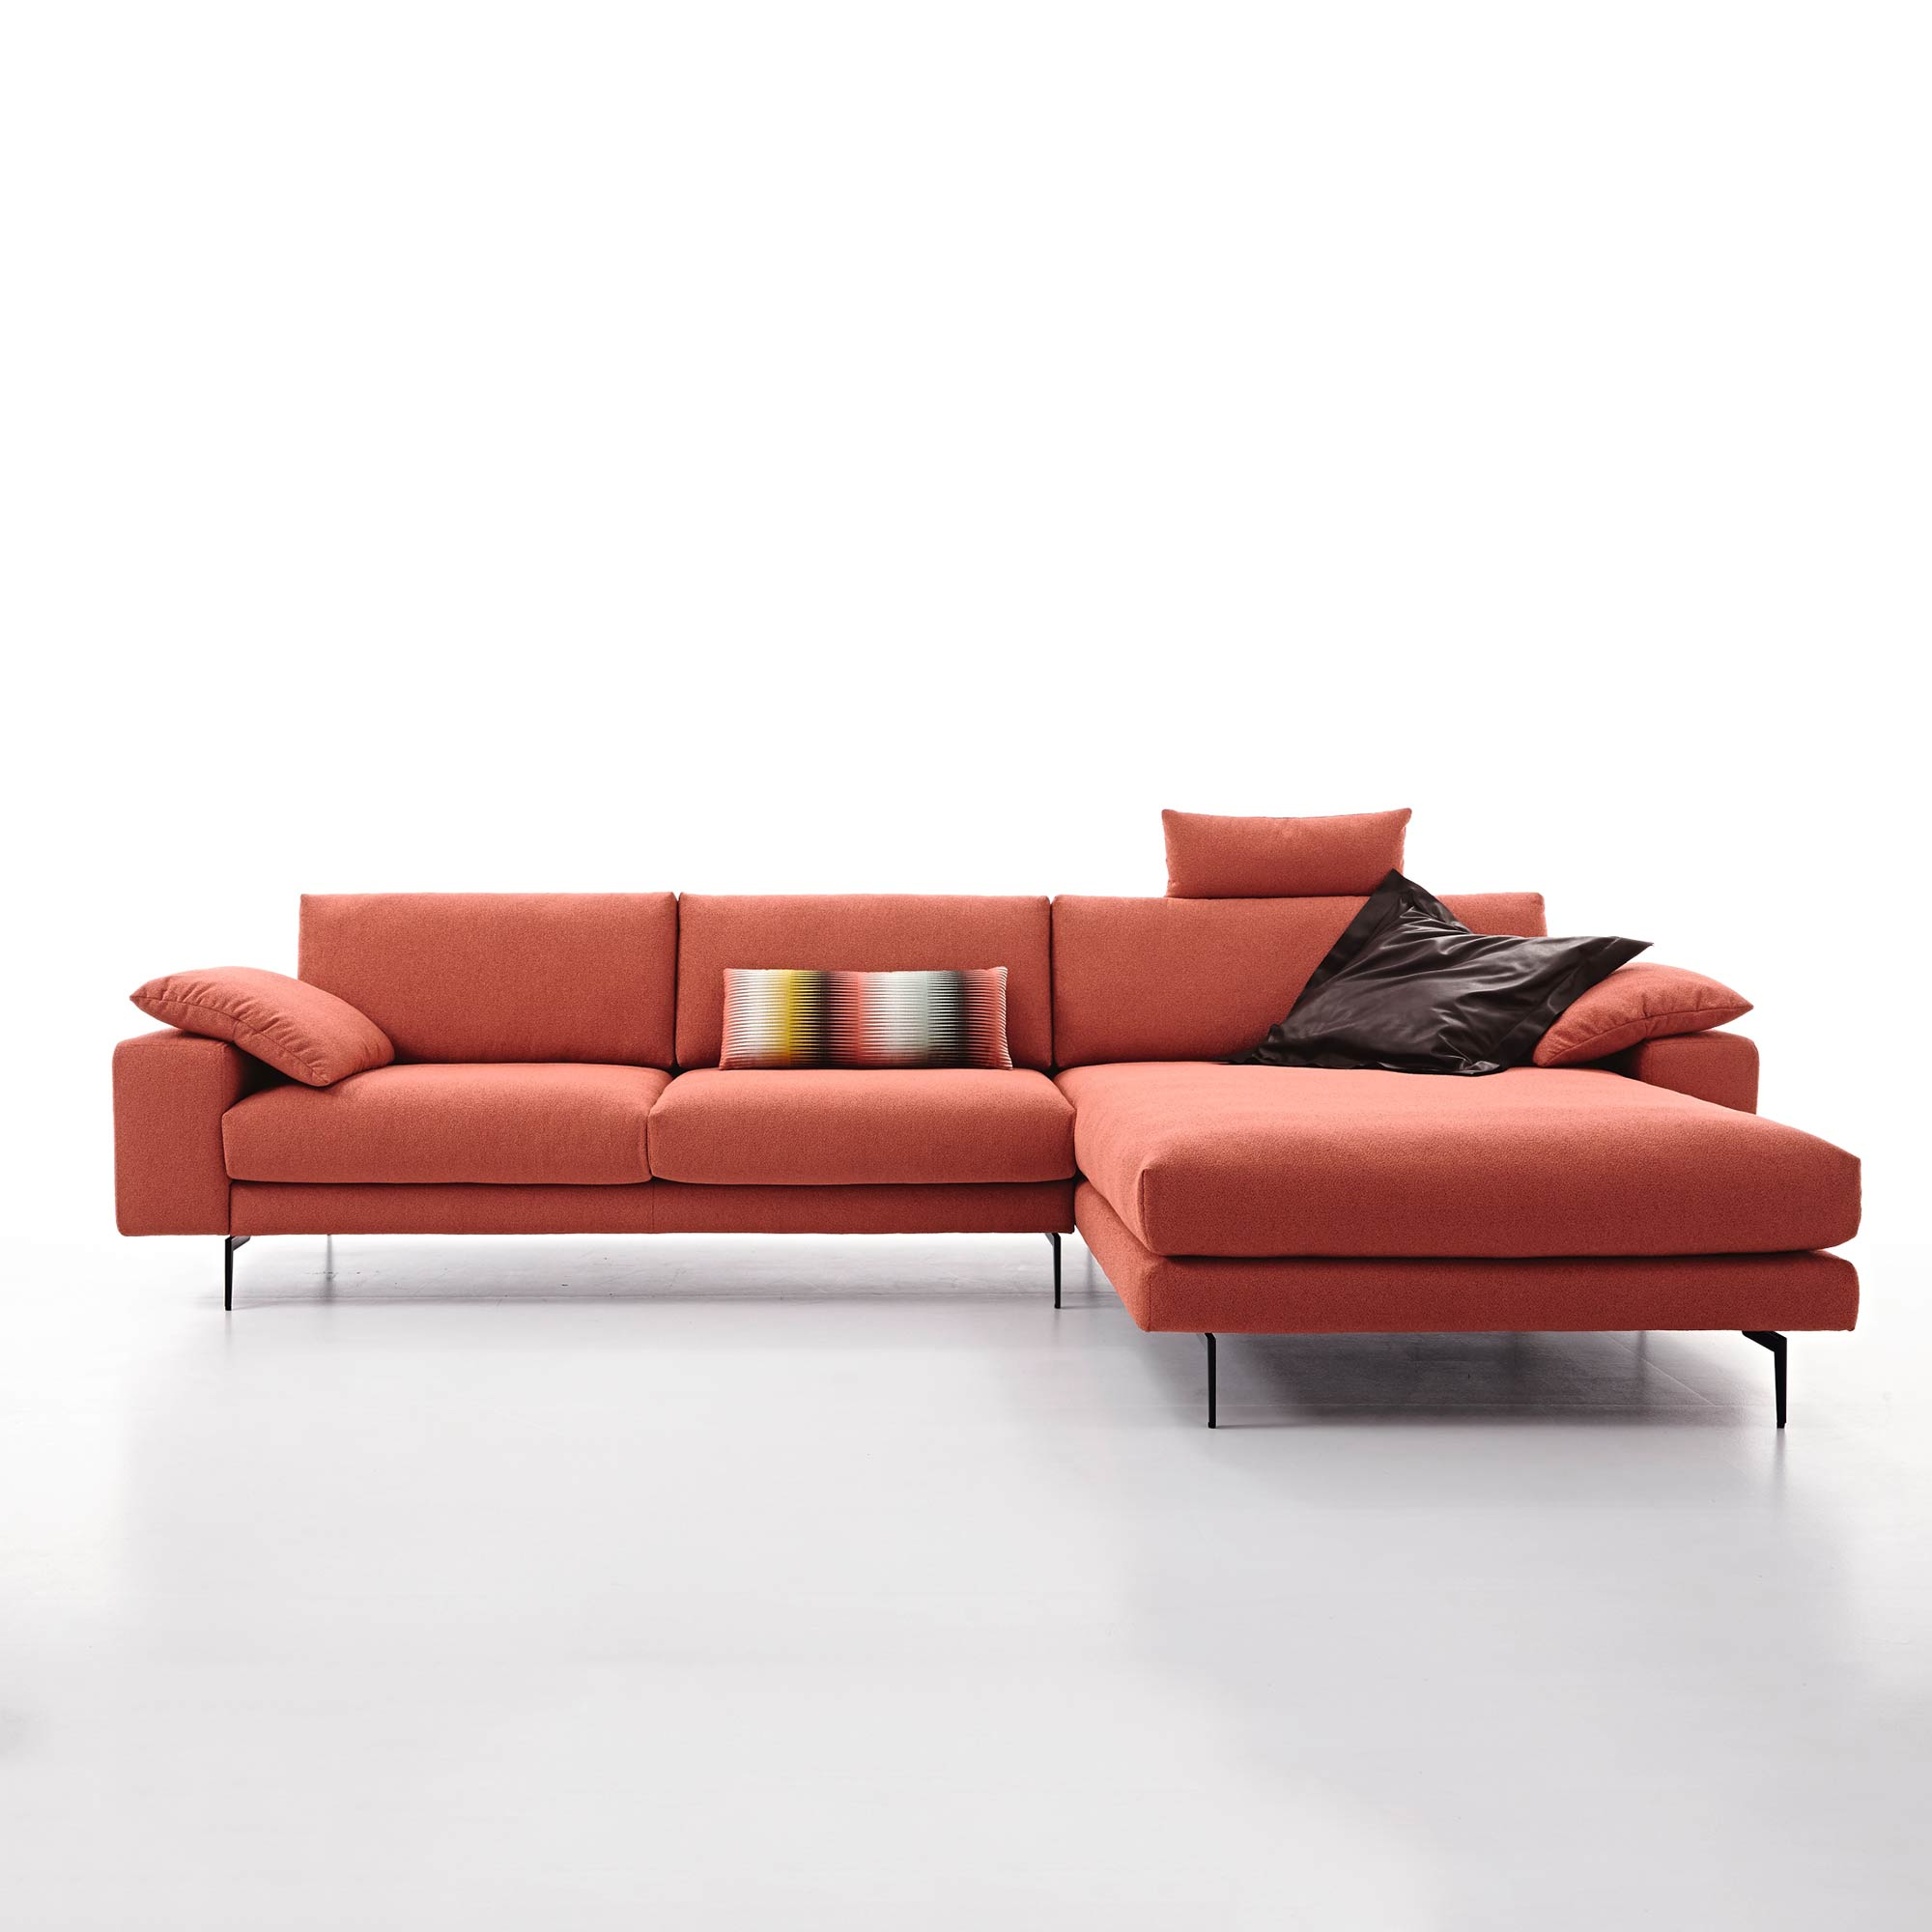 Full Size of Koinor Sofa Couch Erfahrungen Francis 2 Sitzer Leder Braun Gebraucht Kaufen Bewertung Uk Lederfarben Omega Mbel Br Ag Big Kolonialstil W Schillig Mit Sofa Koinor Sofa